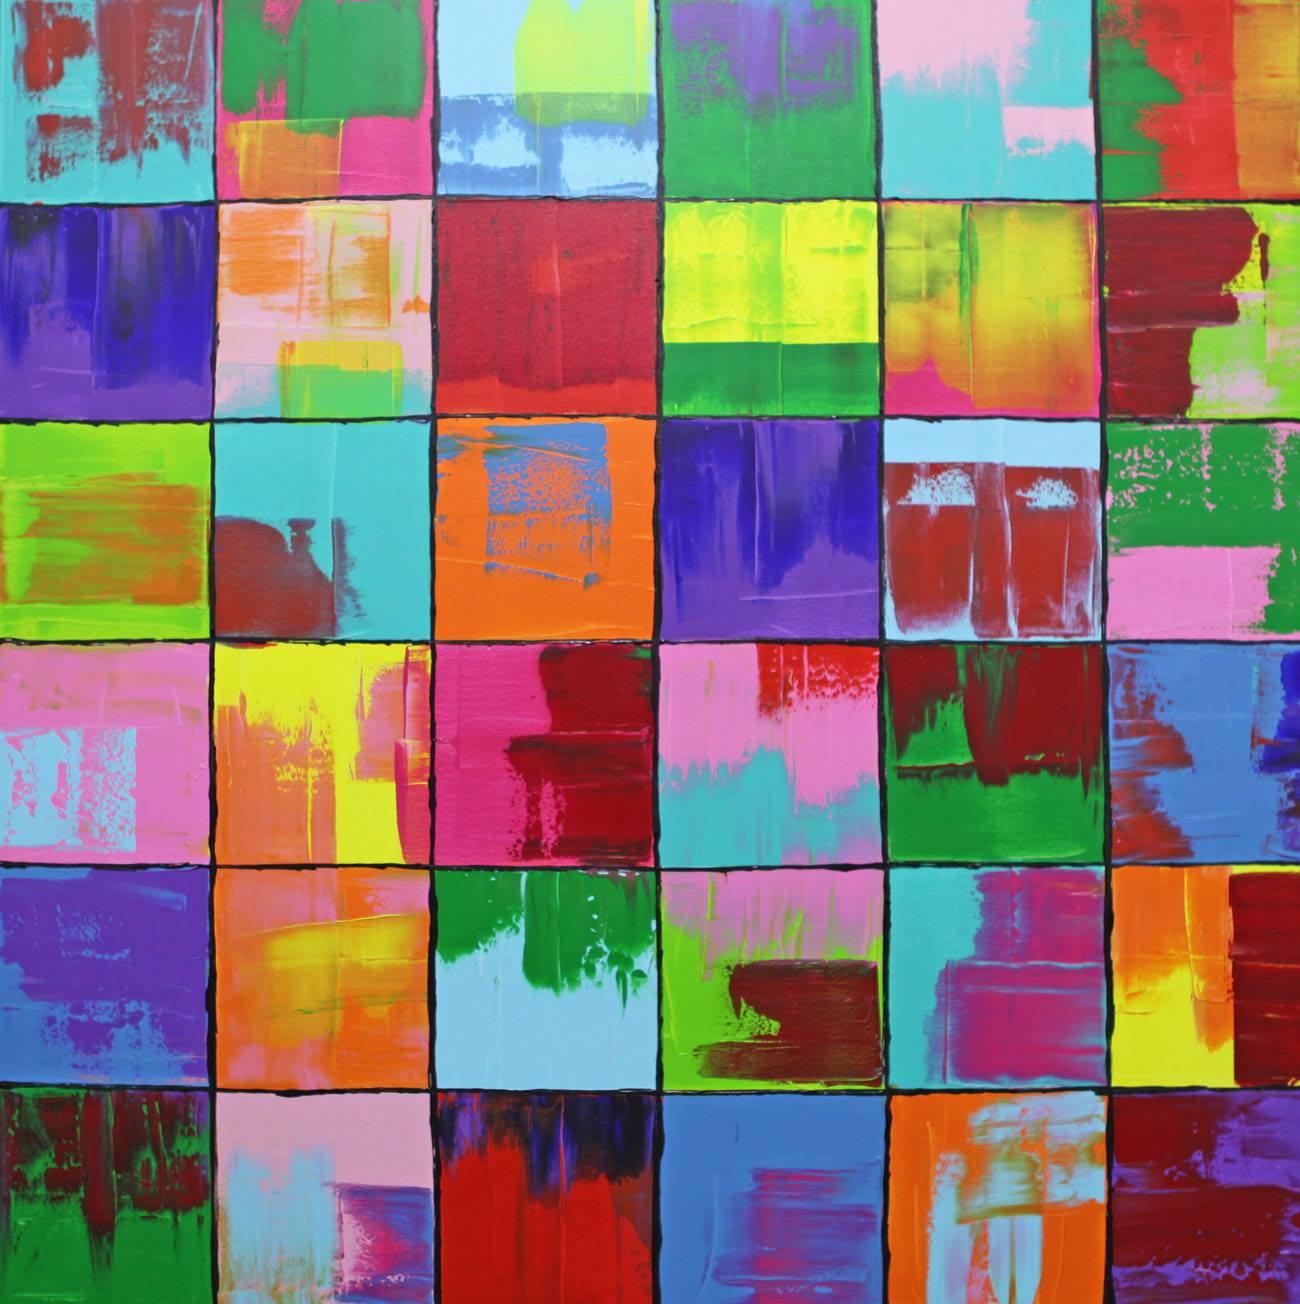 Abstrakte Bilder Art Picture Modern Leinwand Acryl Gemälde Malerei